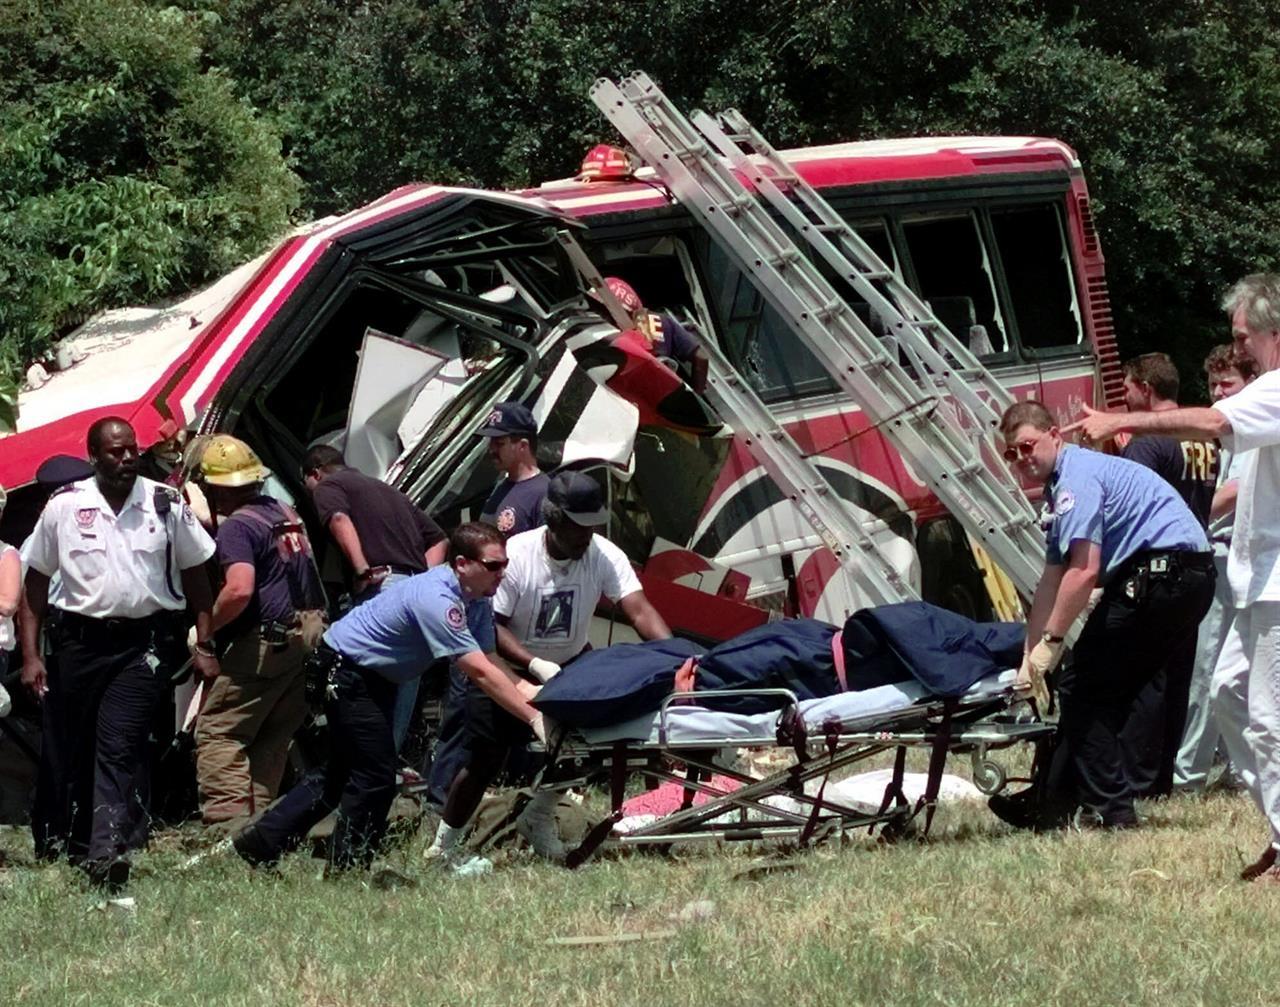 Limousine crash ranks among deadliest US traffic accidents